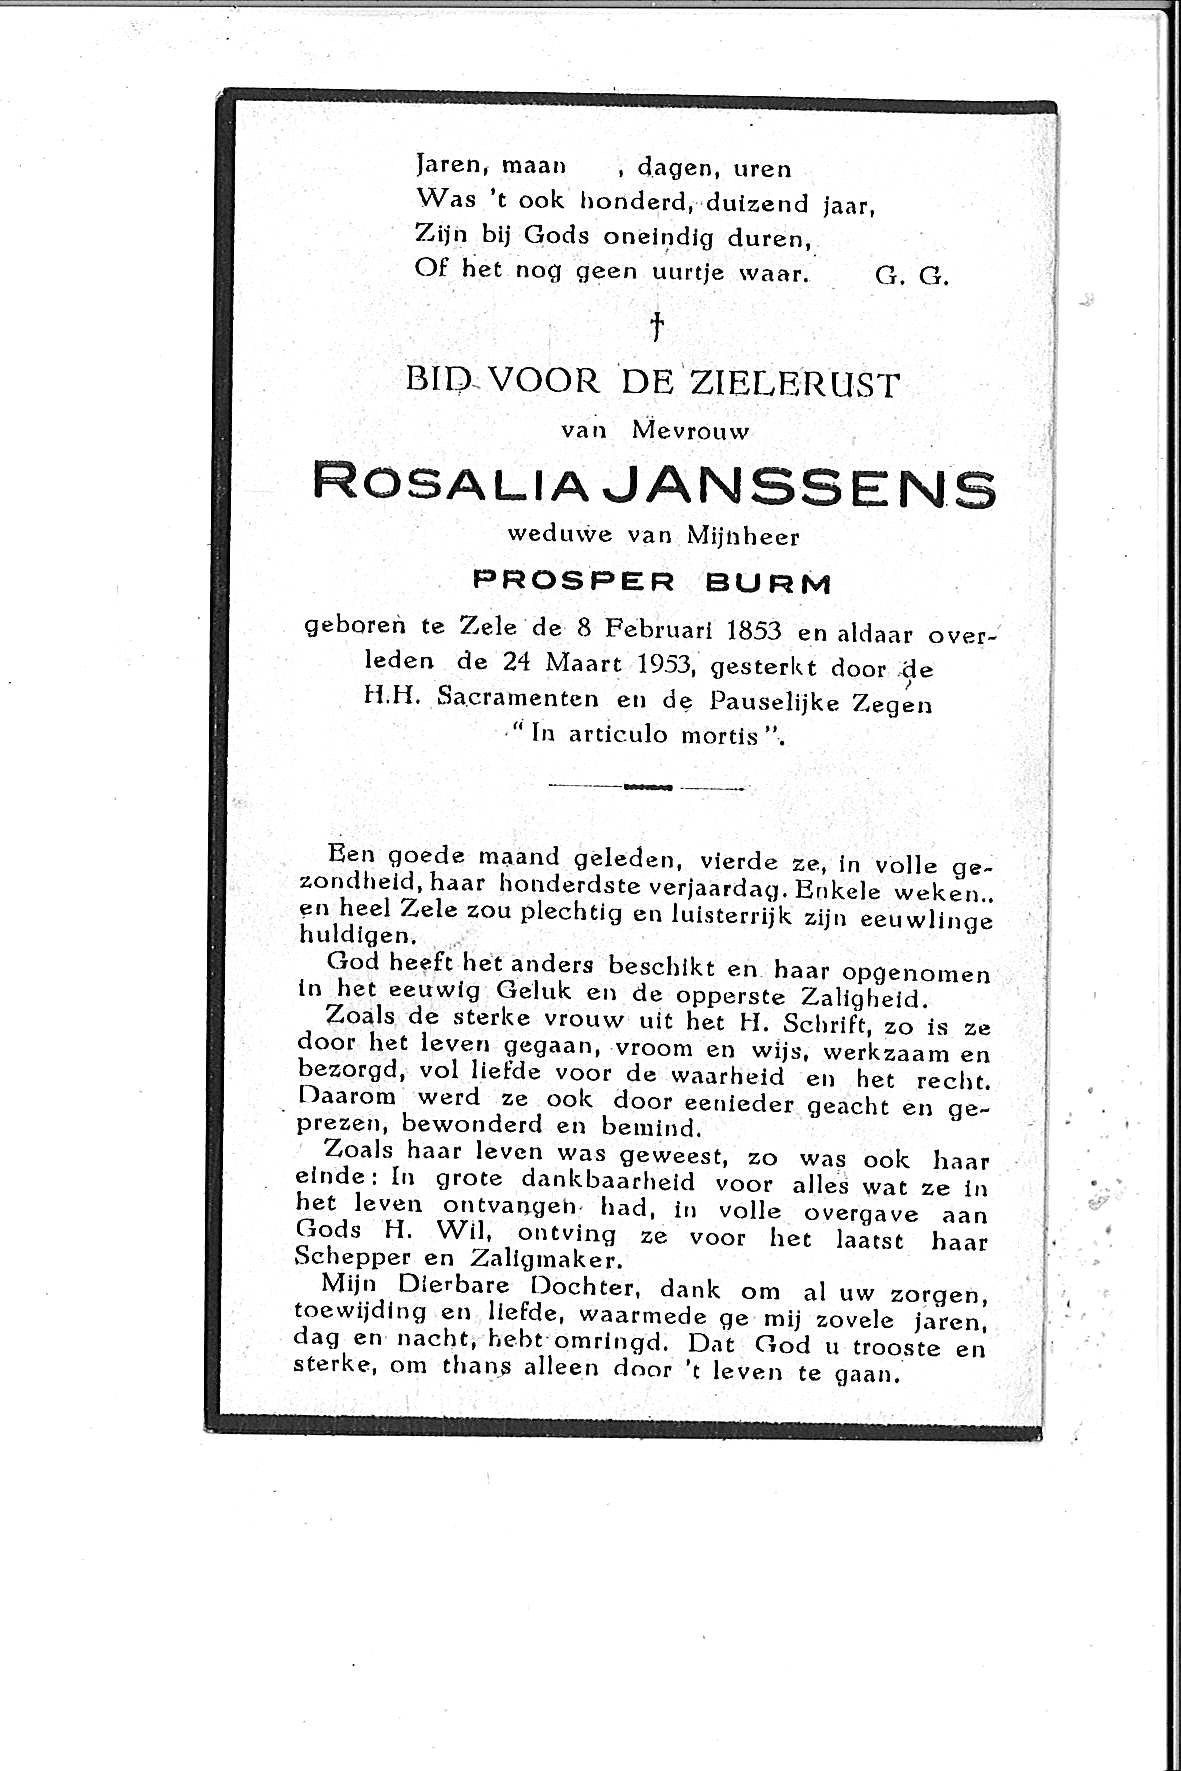 Rosalia(1953)20150504112425_00048.jpg